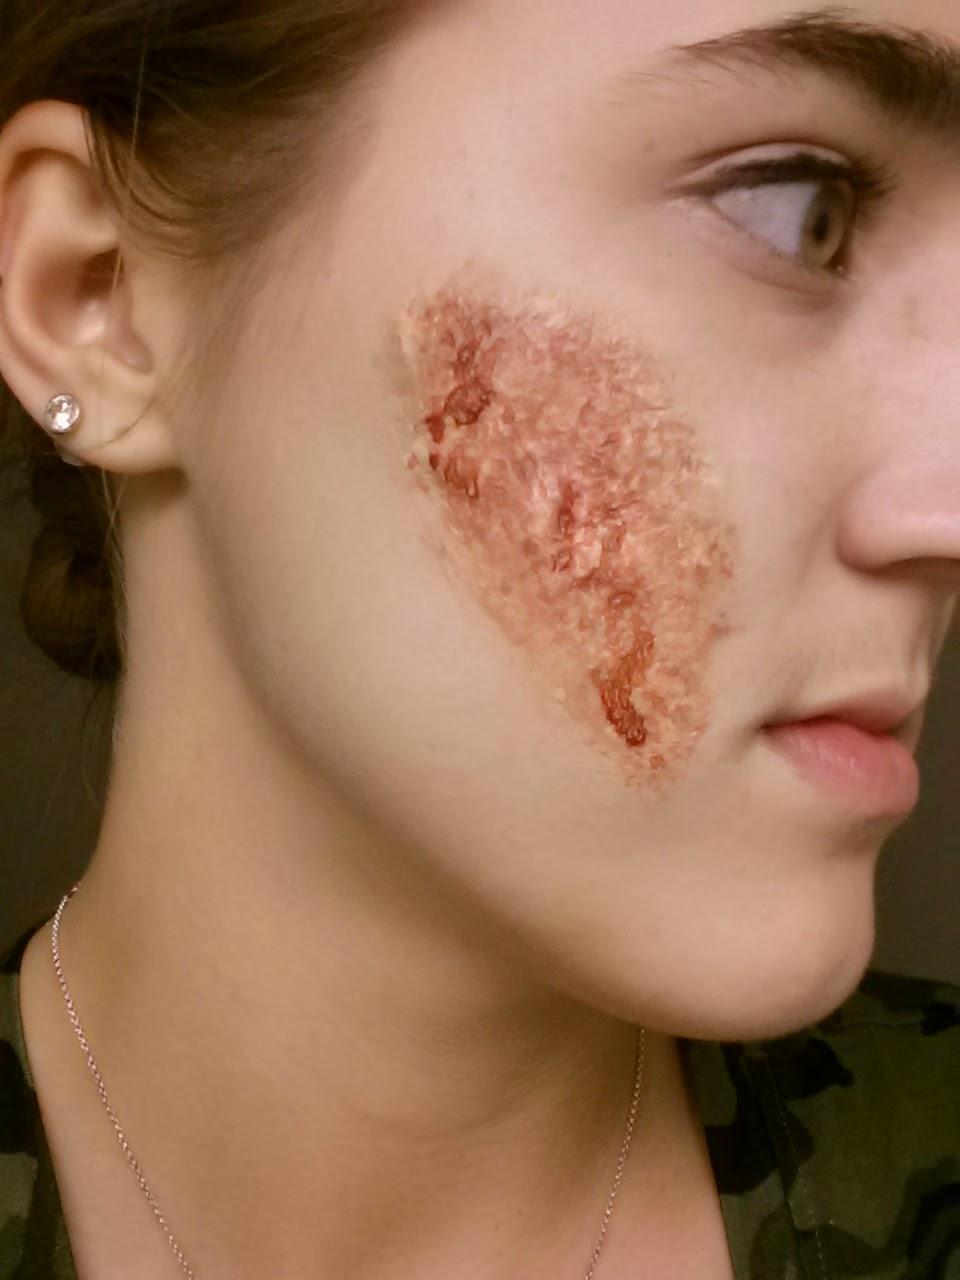 liquid latex scar - quick and easy halloween idea | cydney's makeup